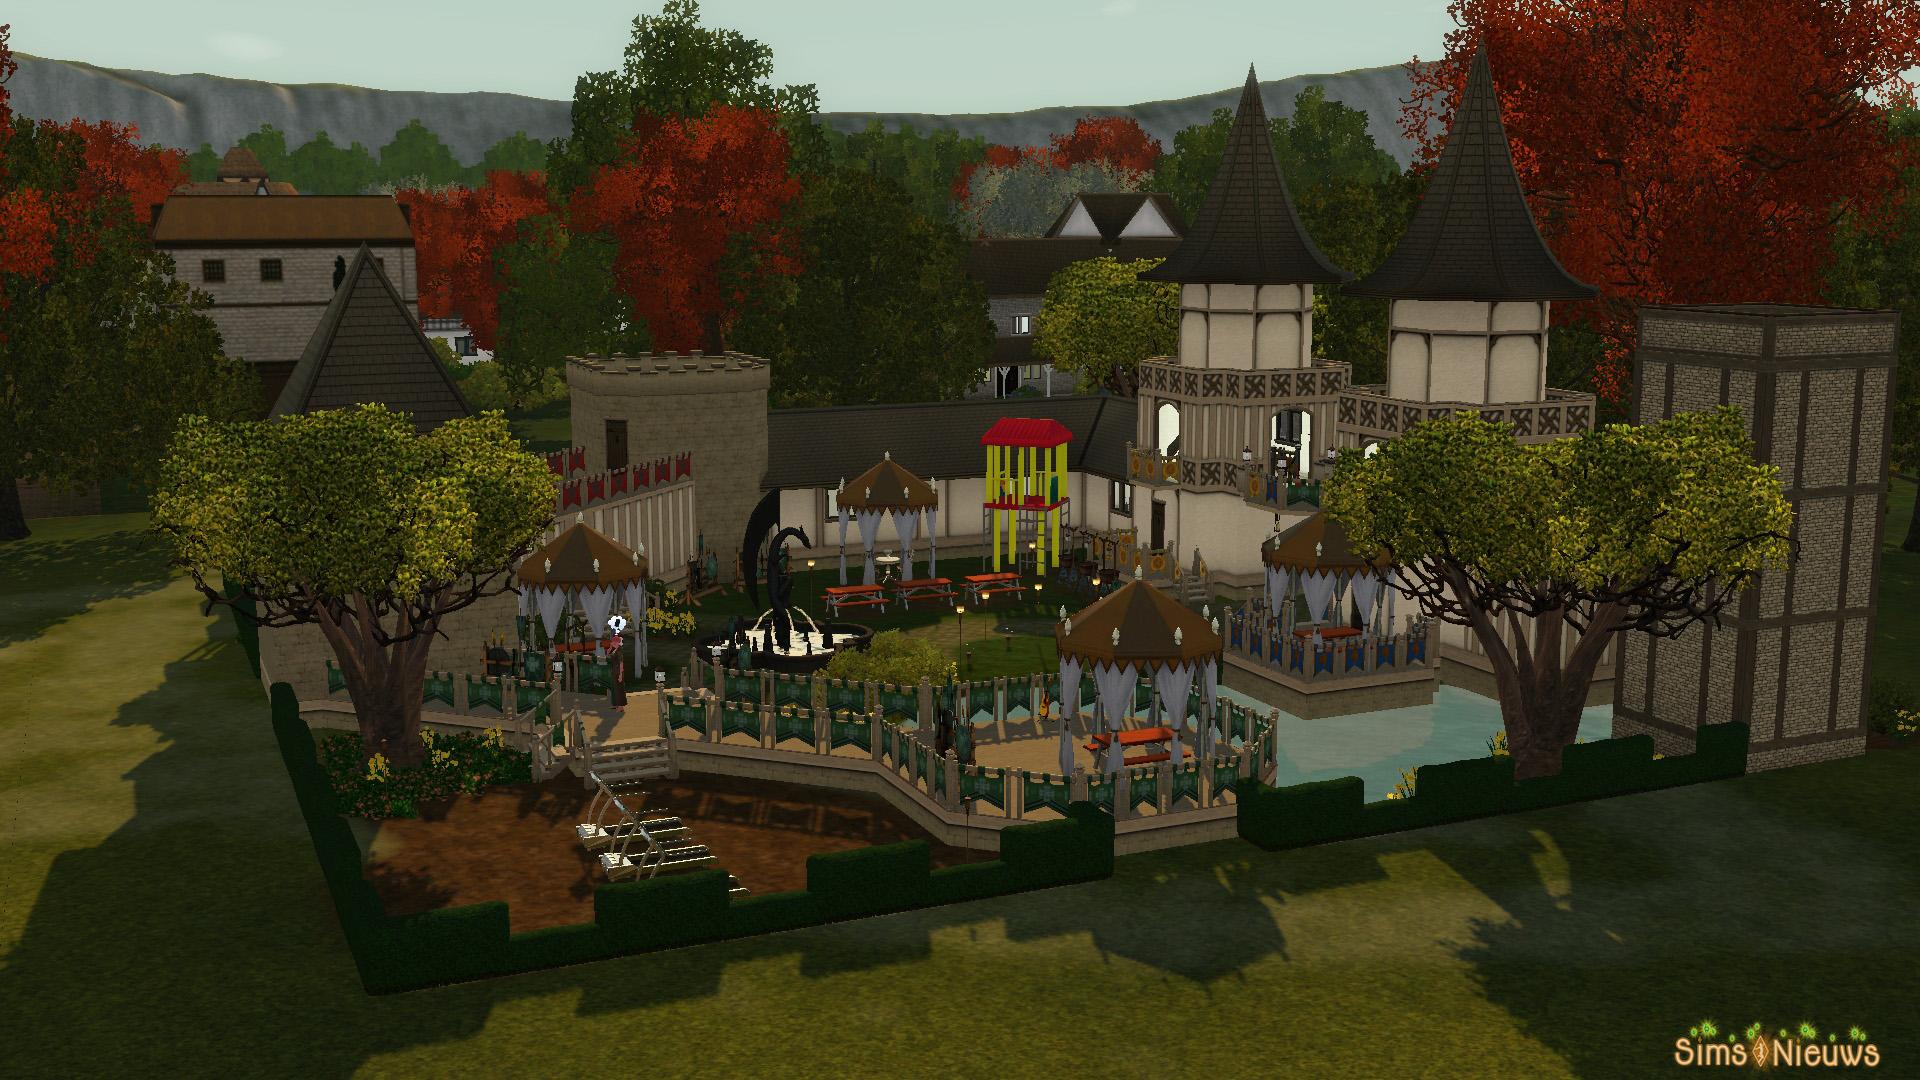 Lintenhertog Balzaal FestivalKavel